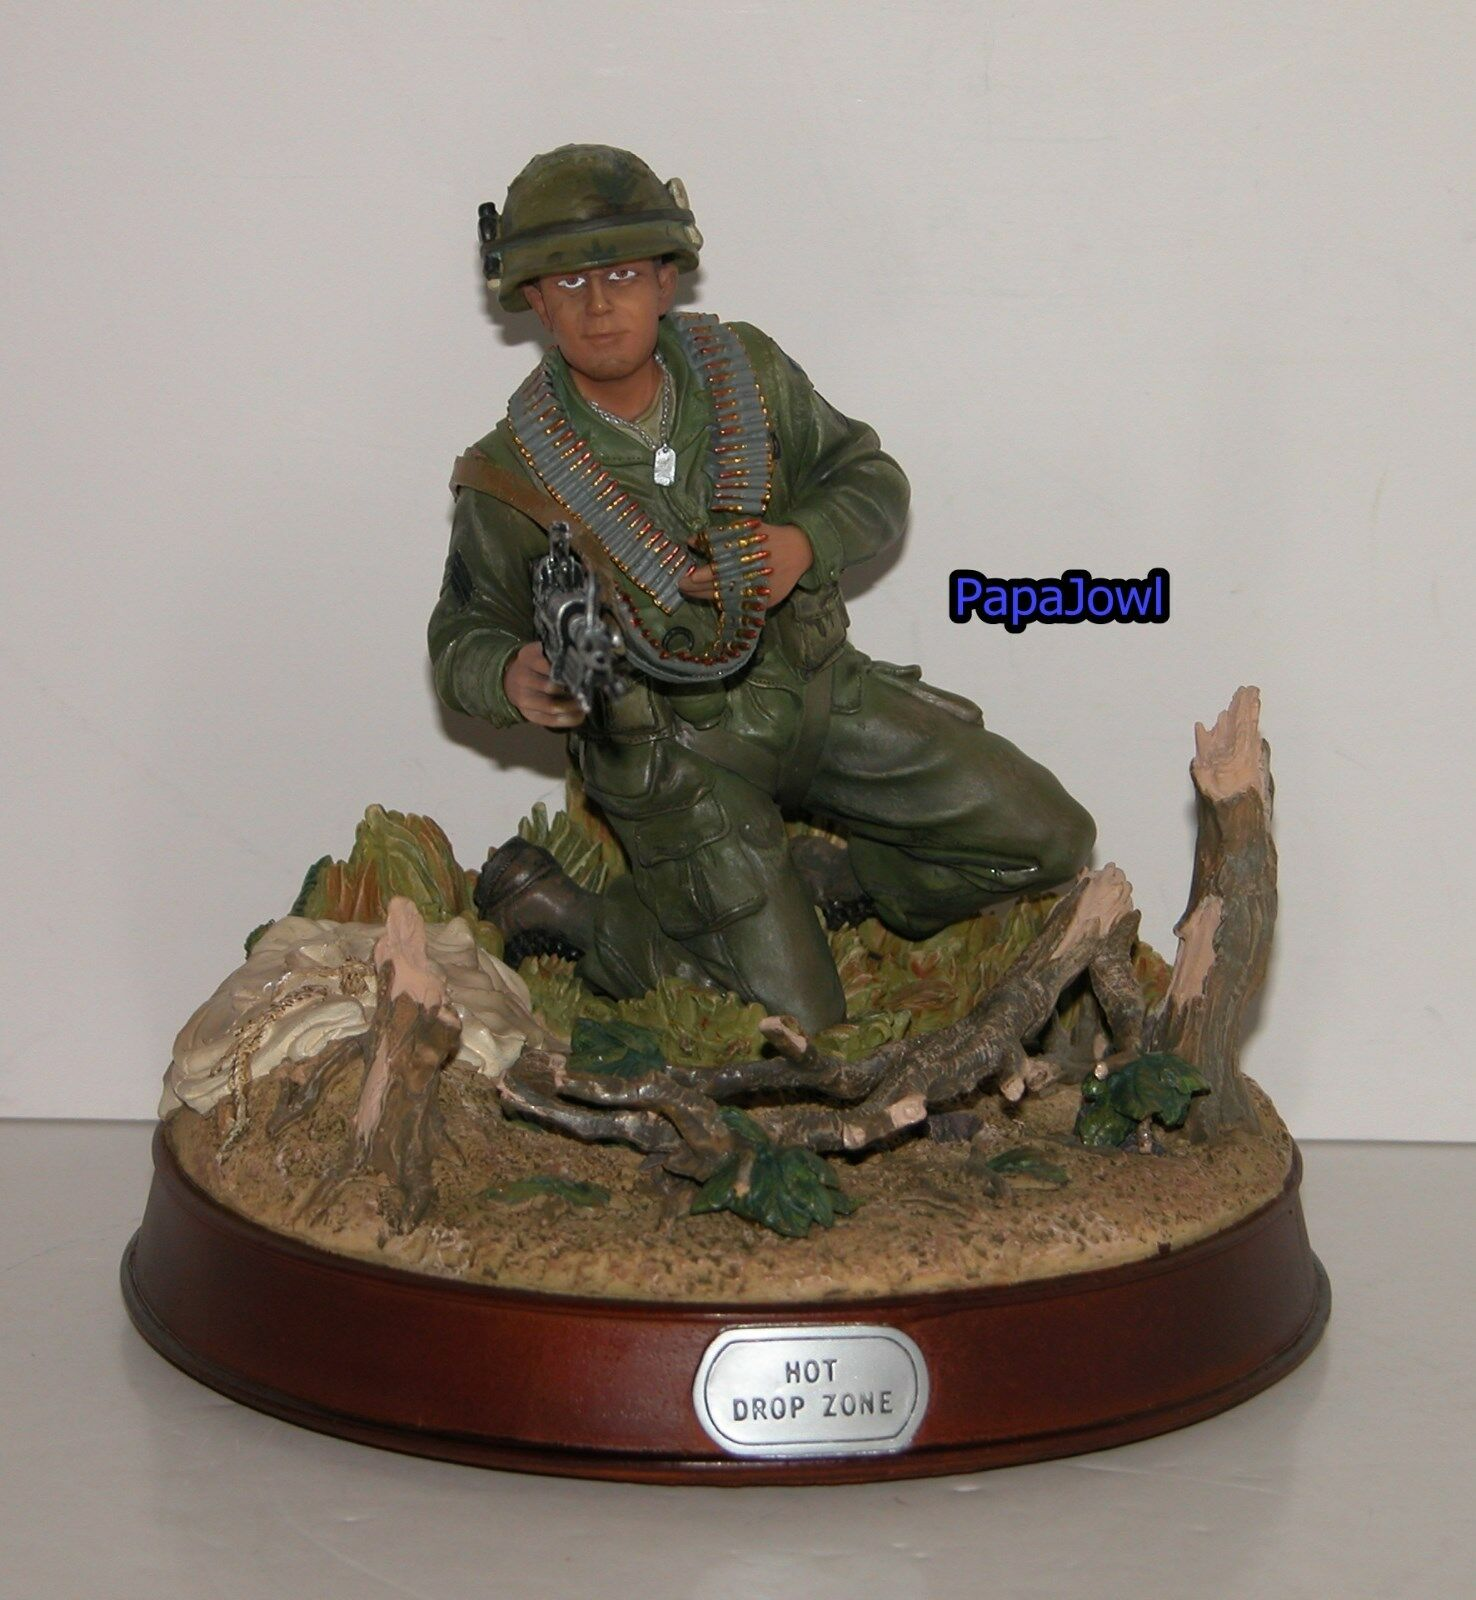 GI Joe Unique Display Piece Military Metal Series Hot Drop Zone Statue Hasbro